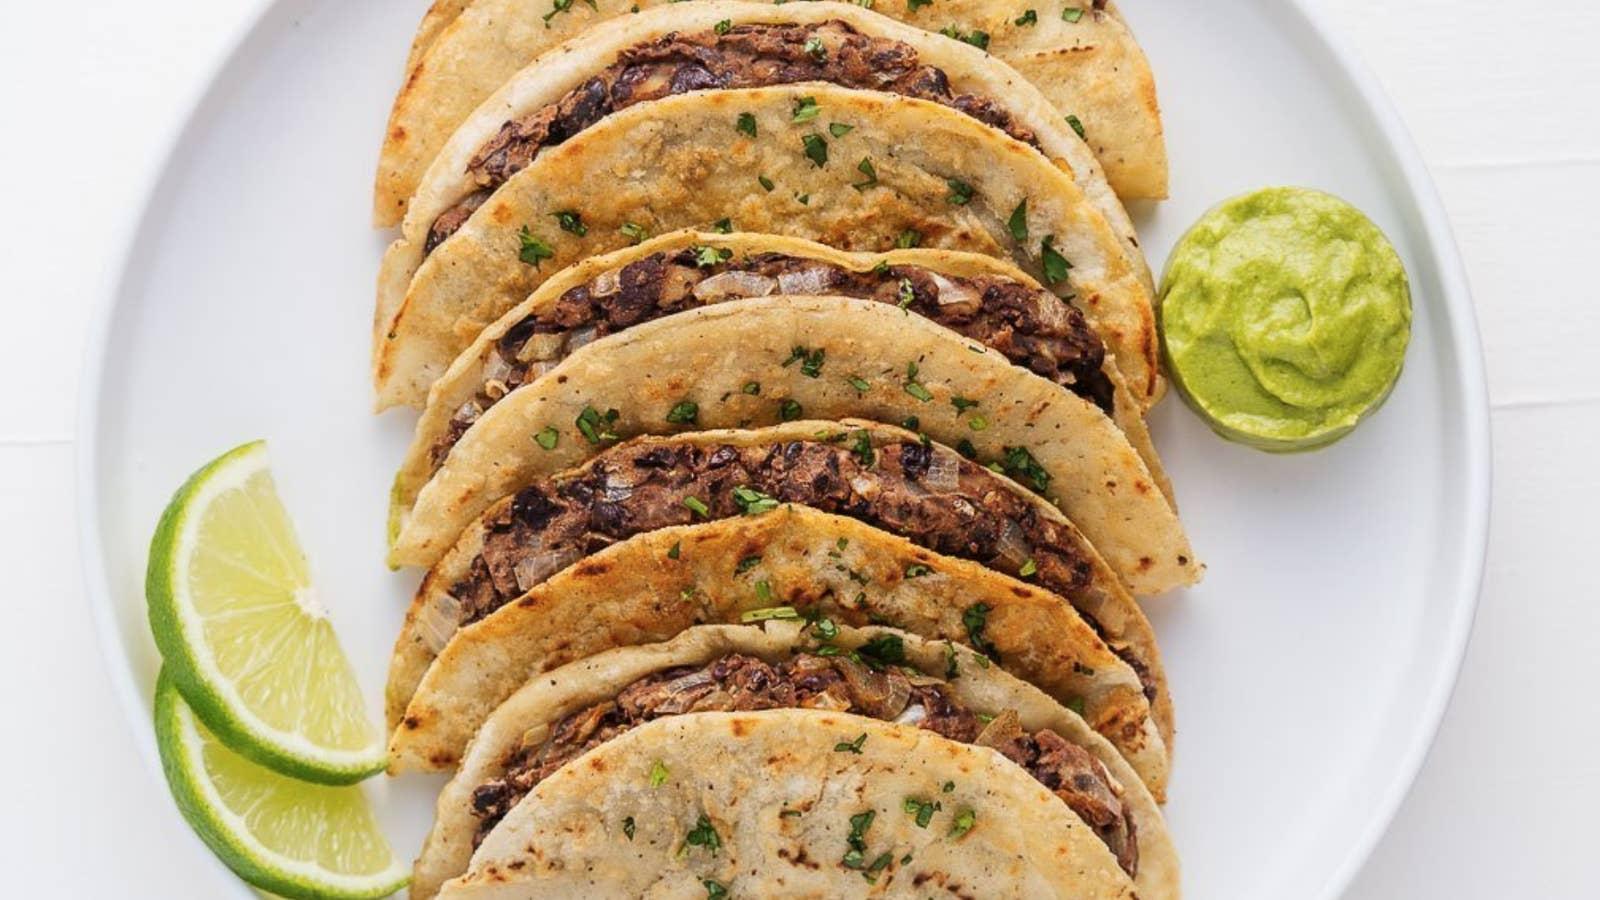 Crispy Black Bean Tacos With Avocado Cream Sauce